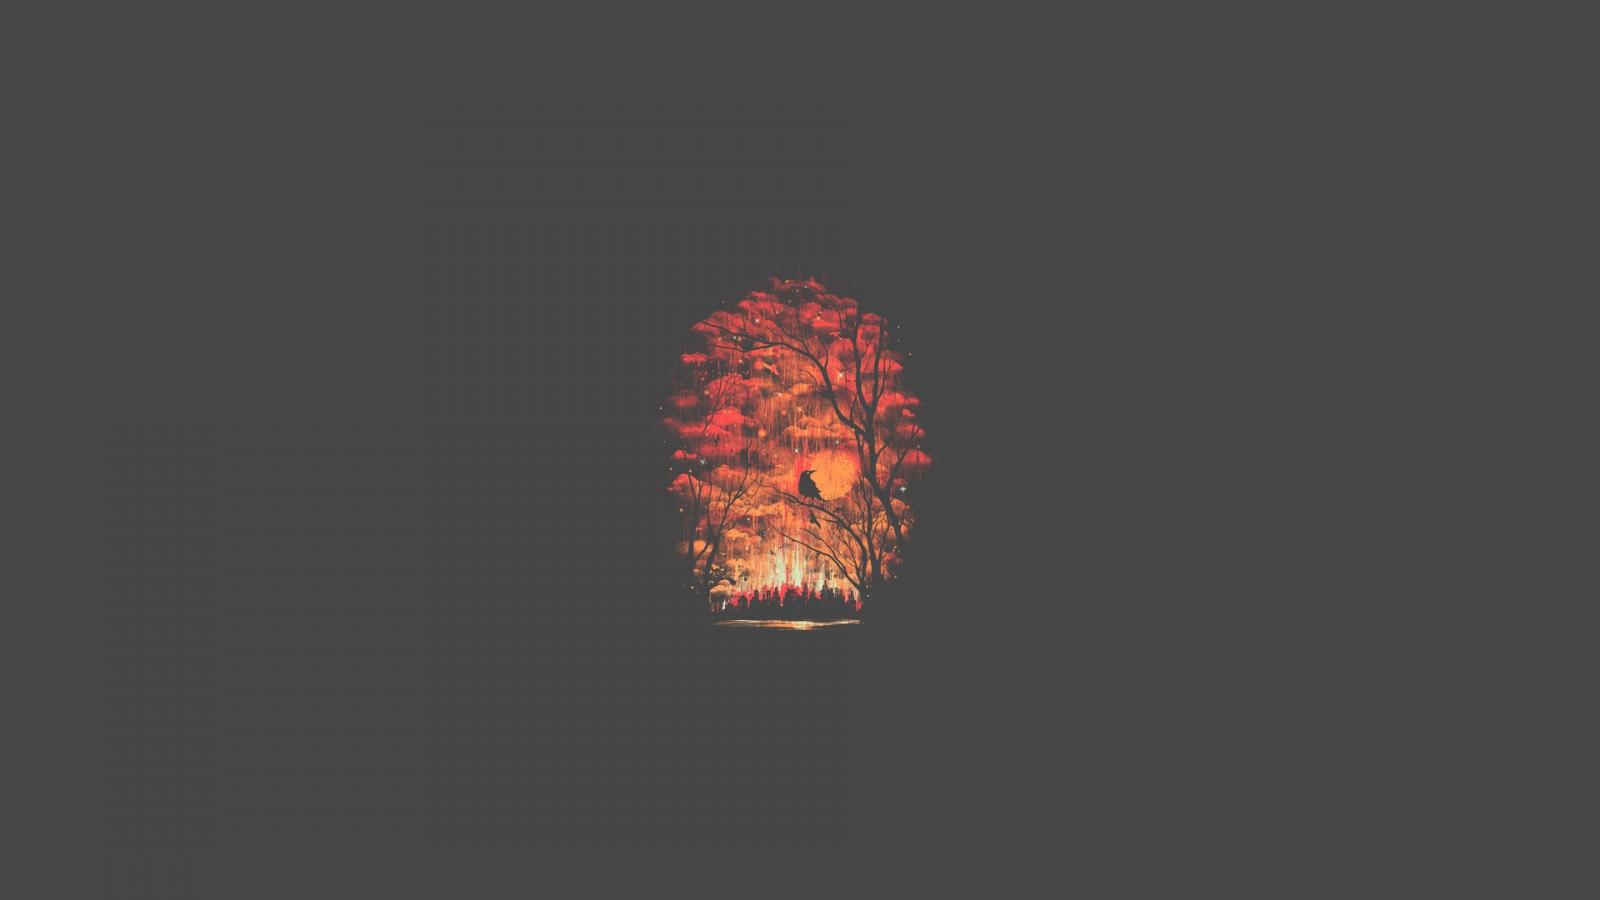 Feuer Beleuchtung | Hintergrundbilder Minimalismus Feuer Beleuchtung Flamme